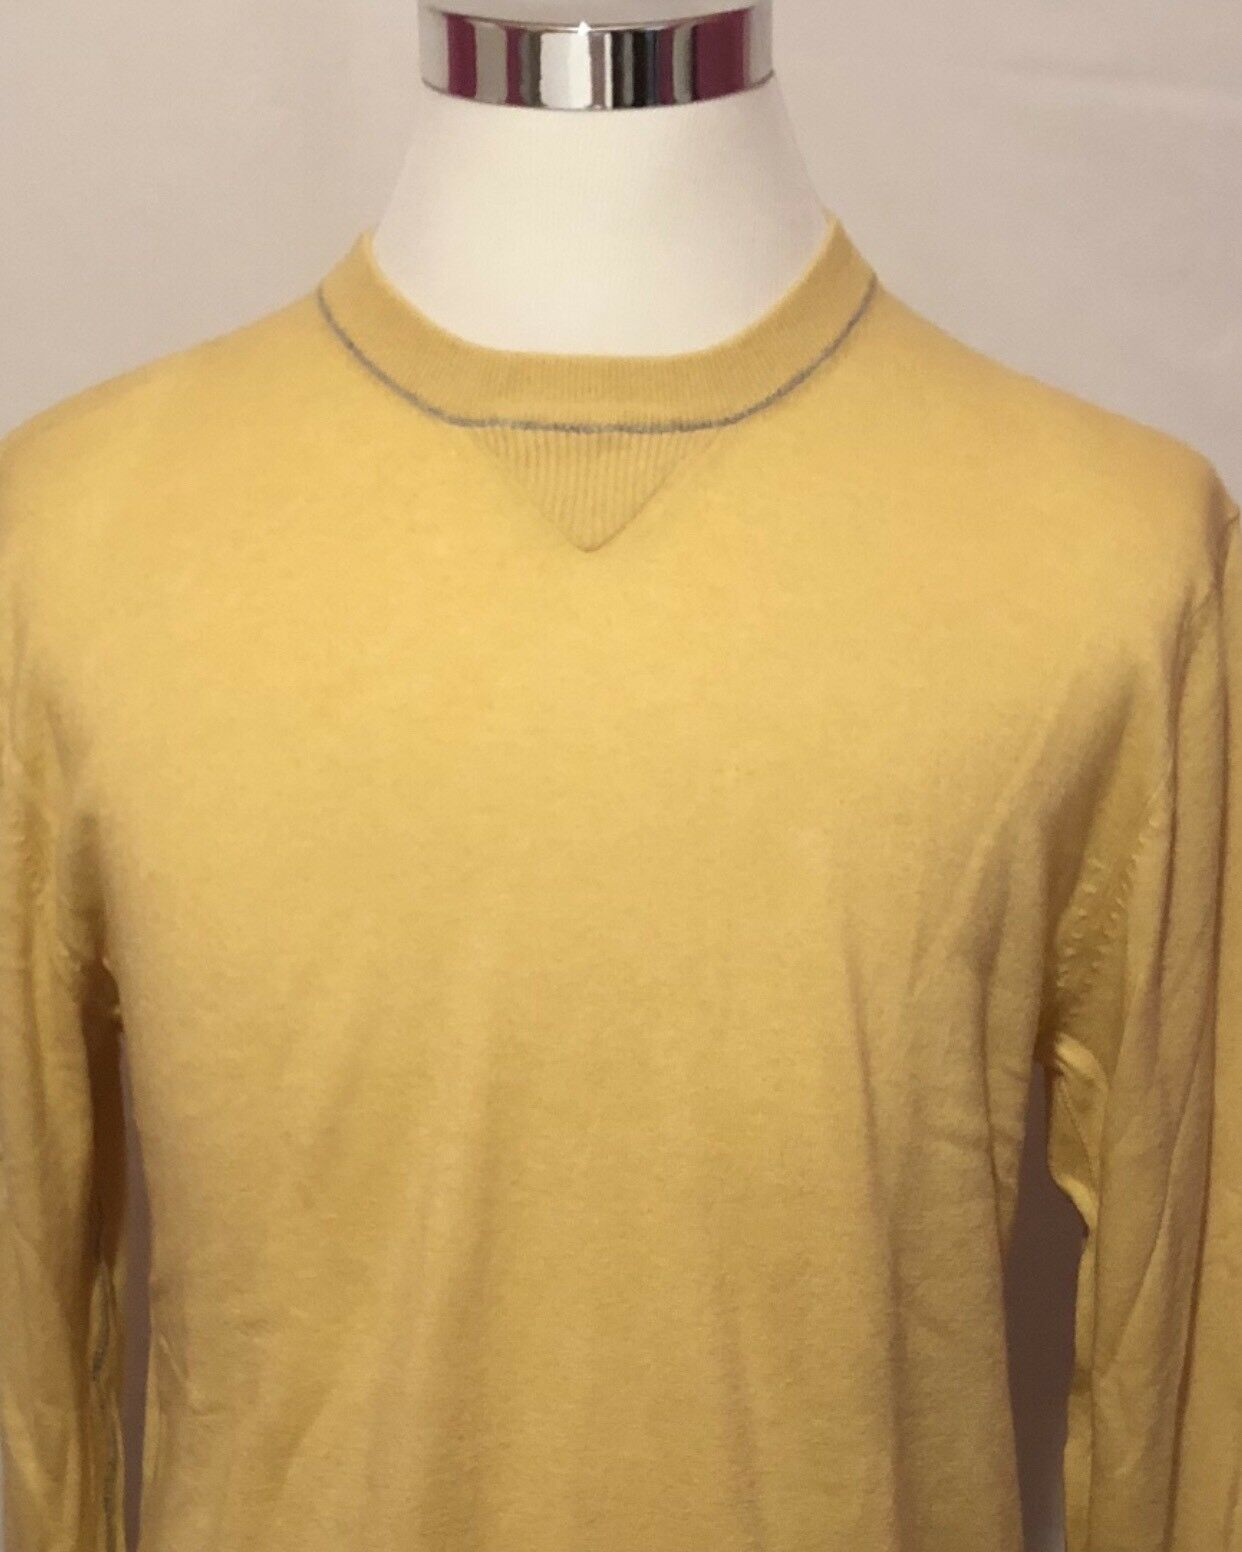 Zegna Sport Mens Cotton Cashmere Blend Sweater Yellow Long Sleeve SZ L